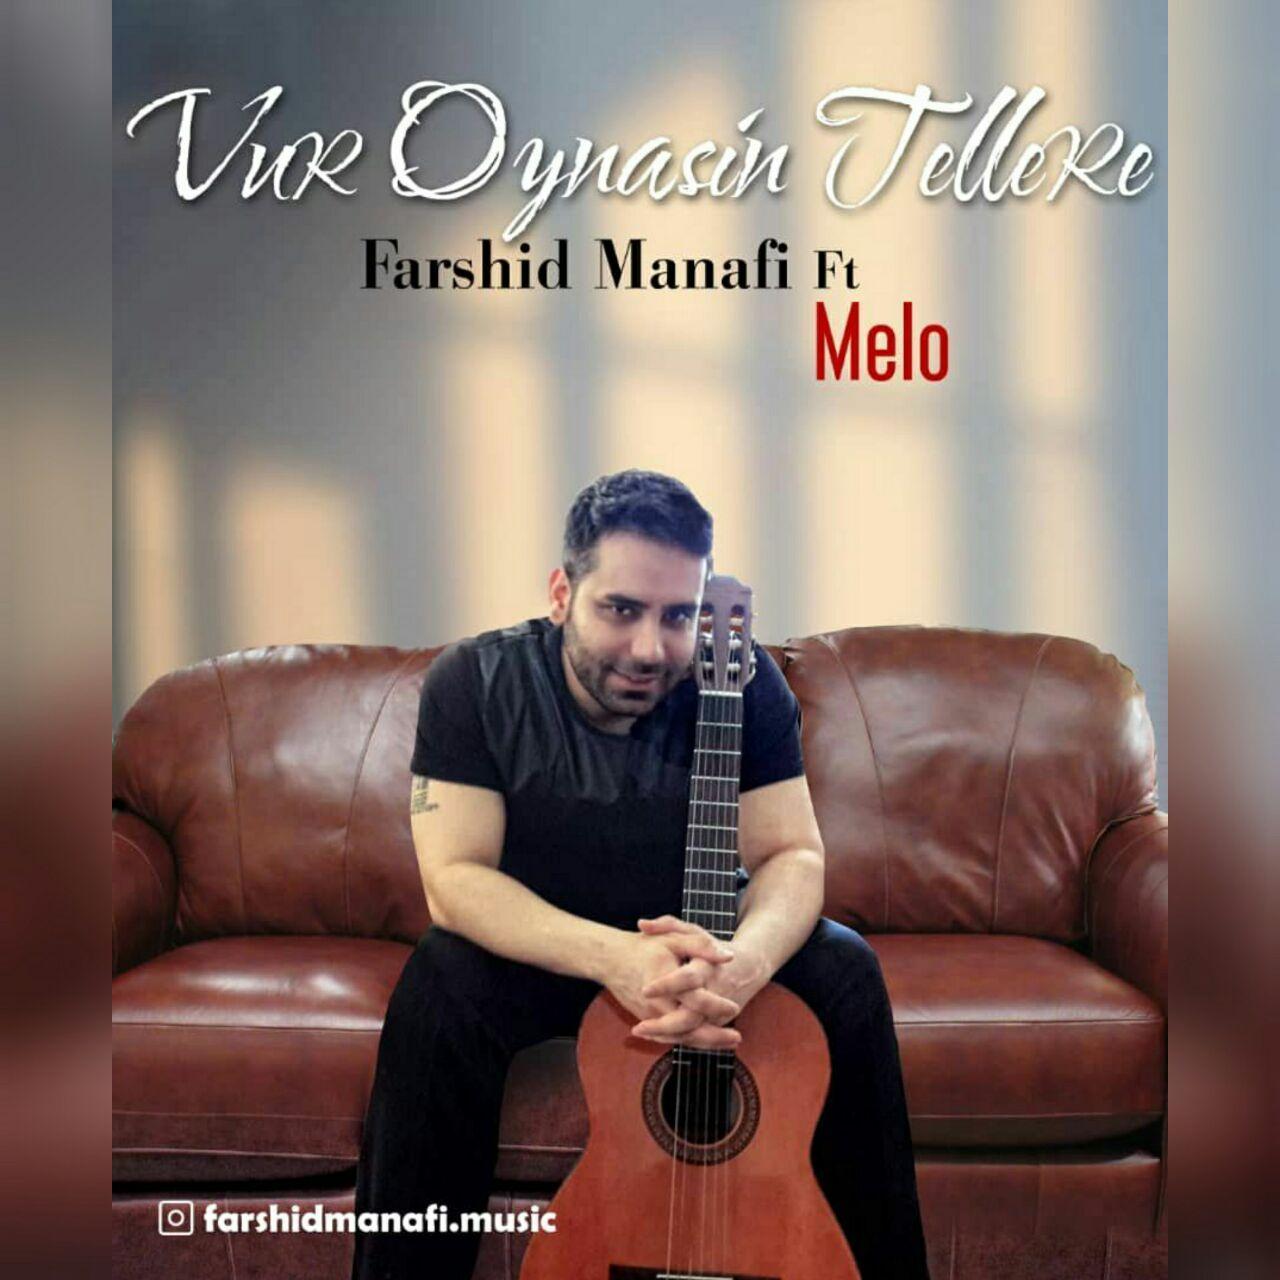 Farshid Manafi – Vur Oynasin Tellere